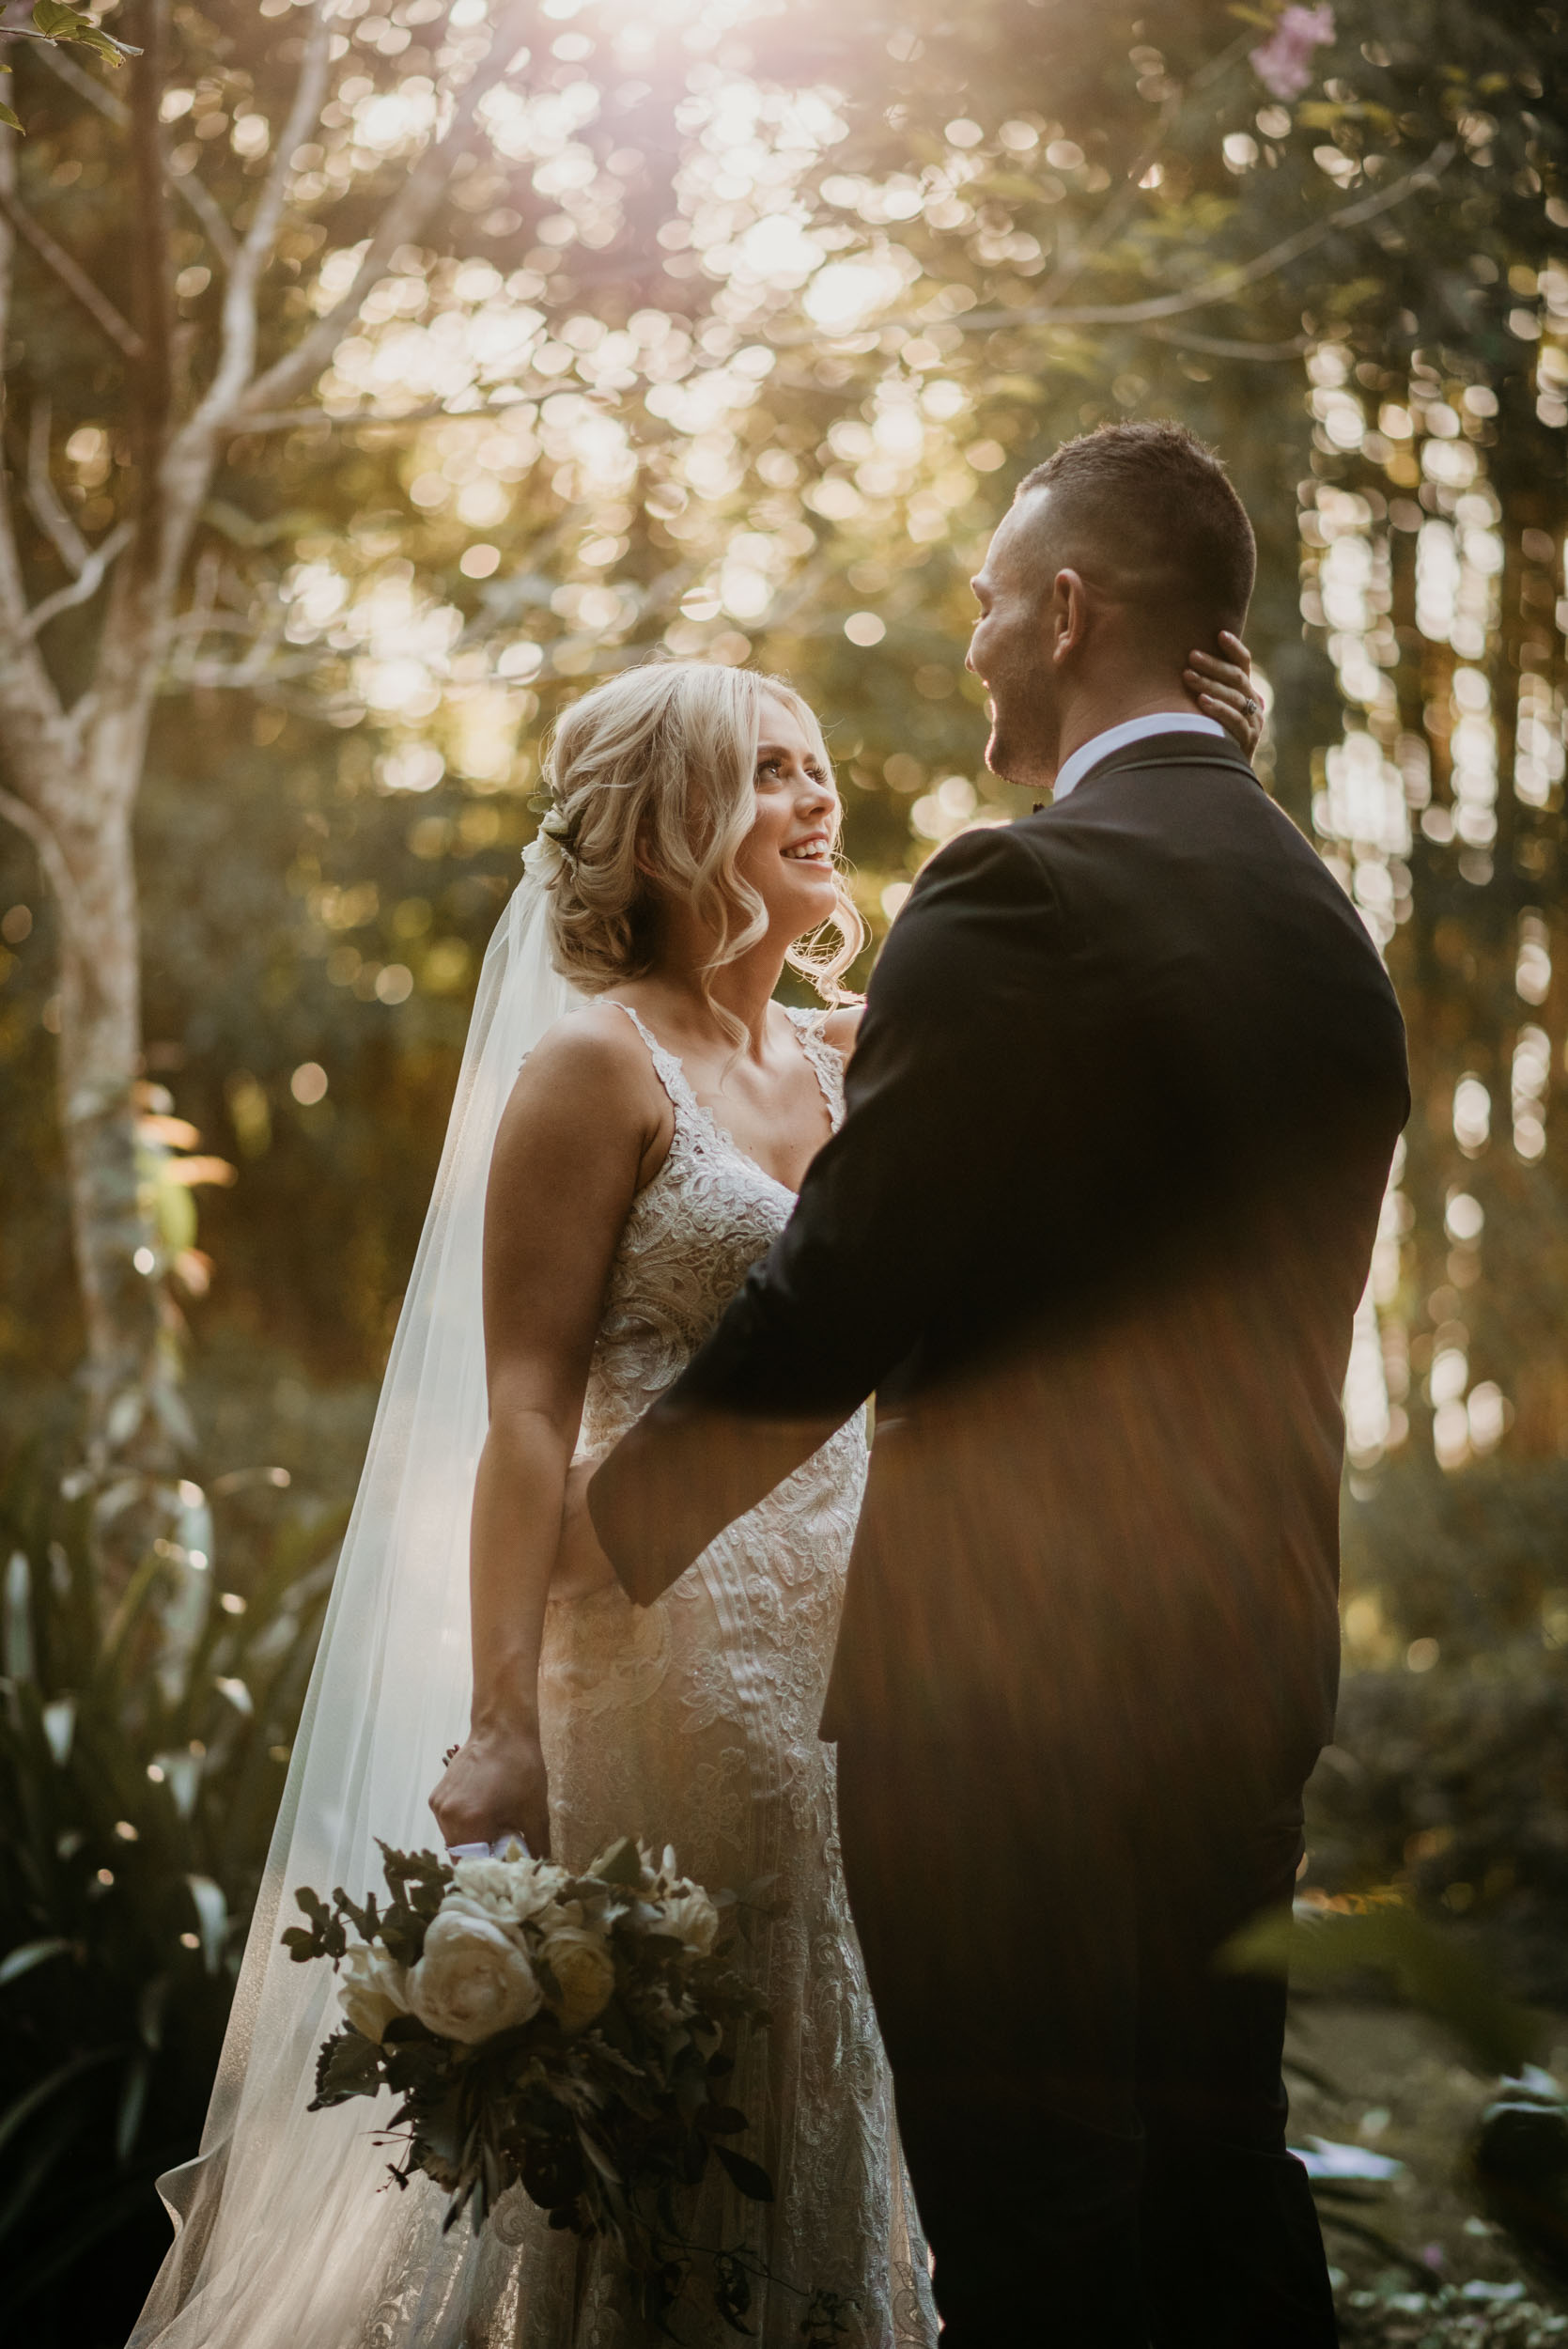 The Raw Photographer - Cairns Wedding Photographer - Laloli - Cairns Garden Wedding - Bride Dress - Destination Wed - Outdoor Reception - Queensland Ceremony-40.jpg